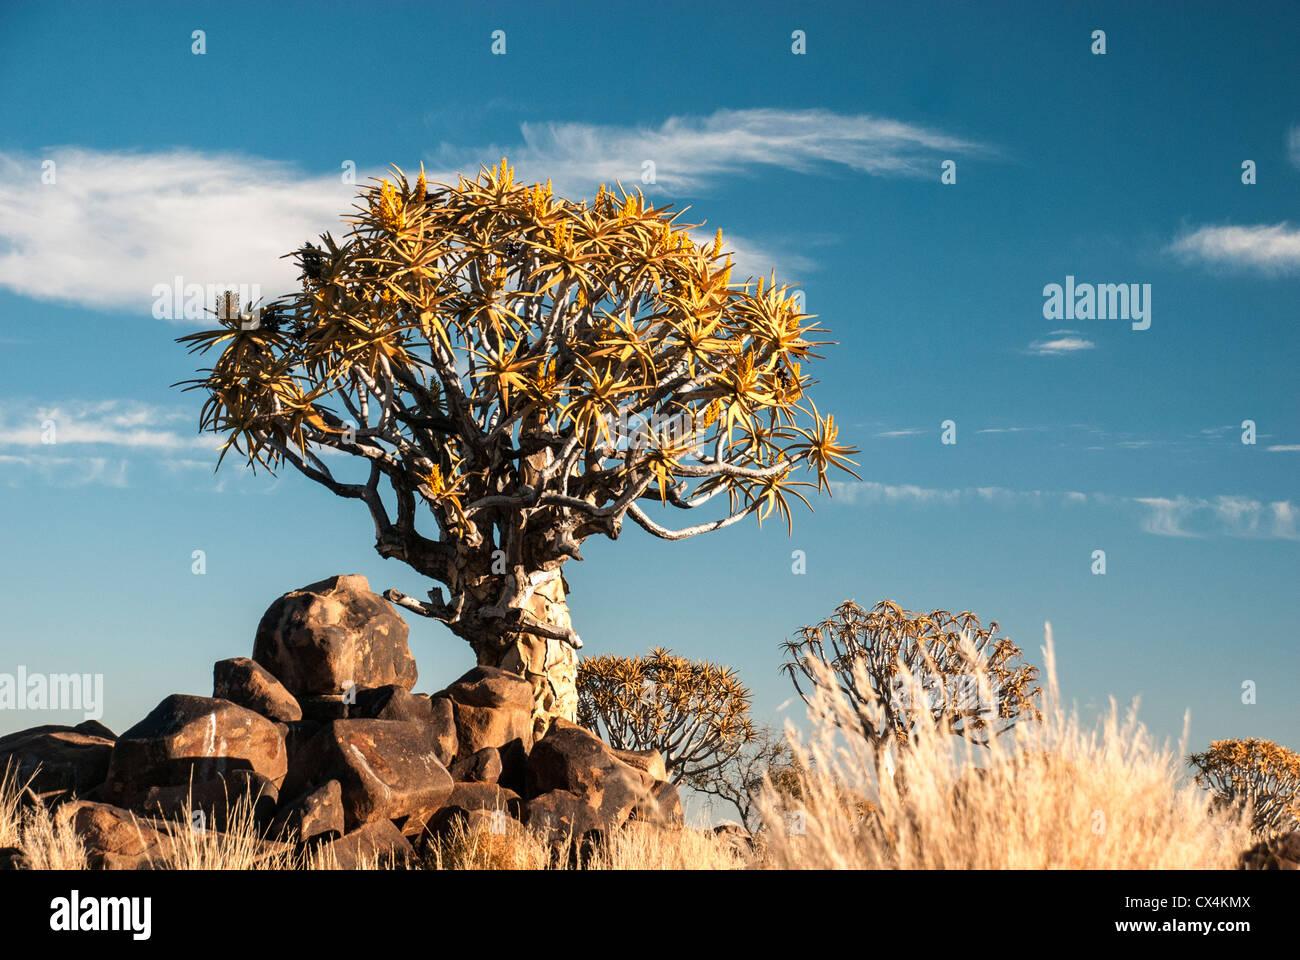 Temblar los árboles, Kocurboom, Aloe dichotoma carcaj árbol bosques, granjas, Keetmannshoop Gariganus, Imagen De Stock